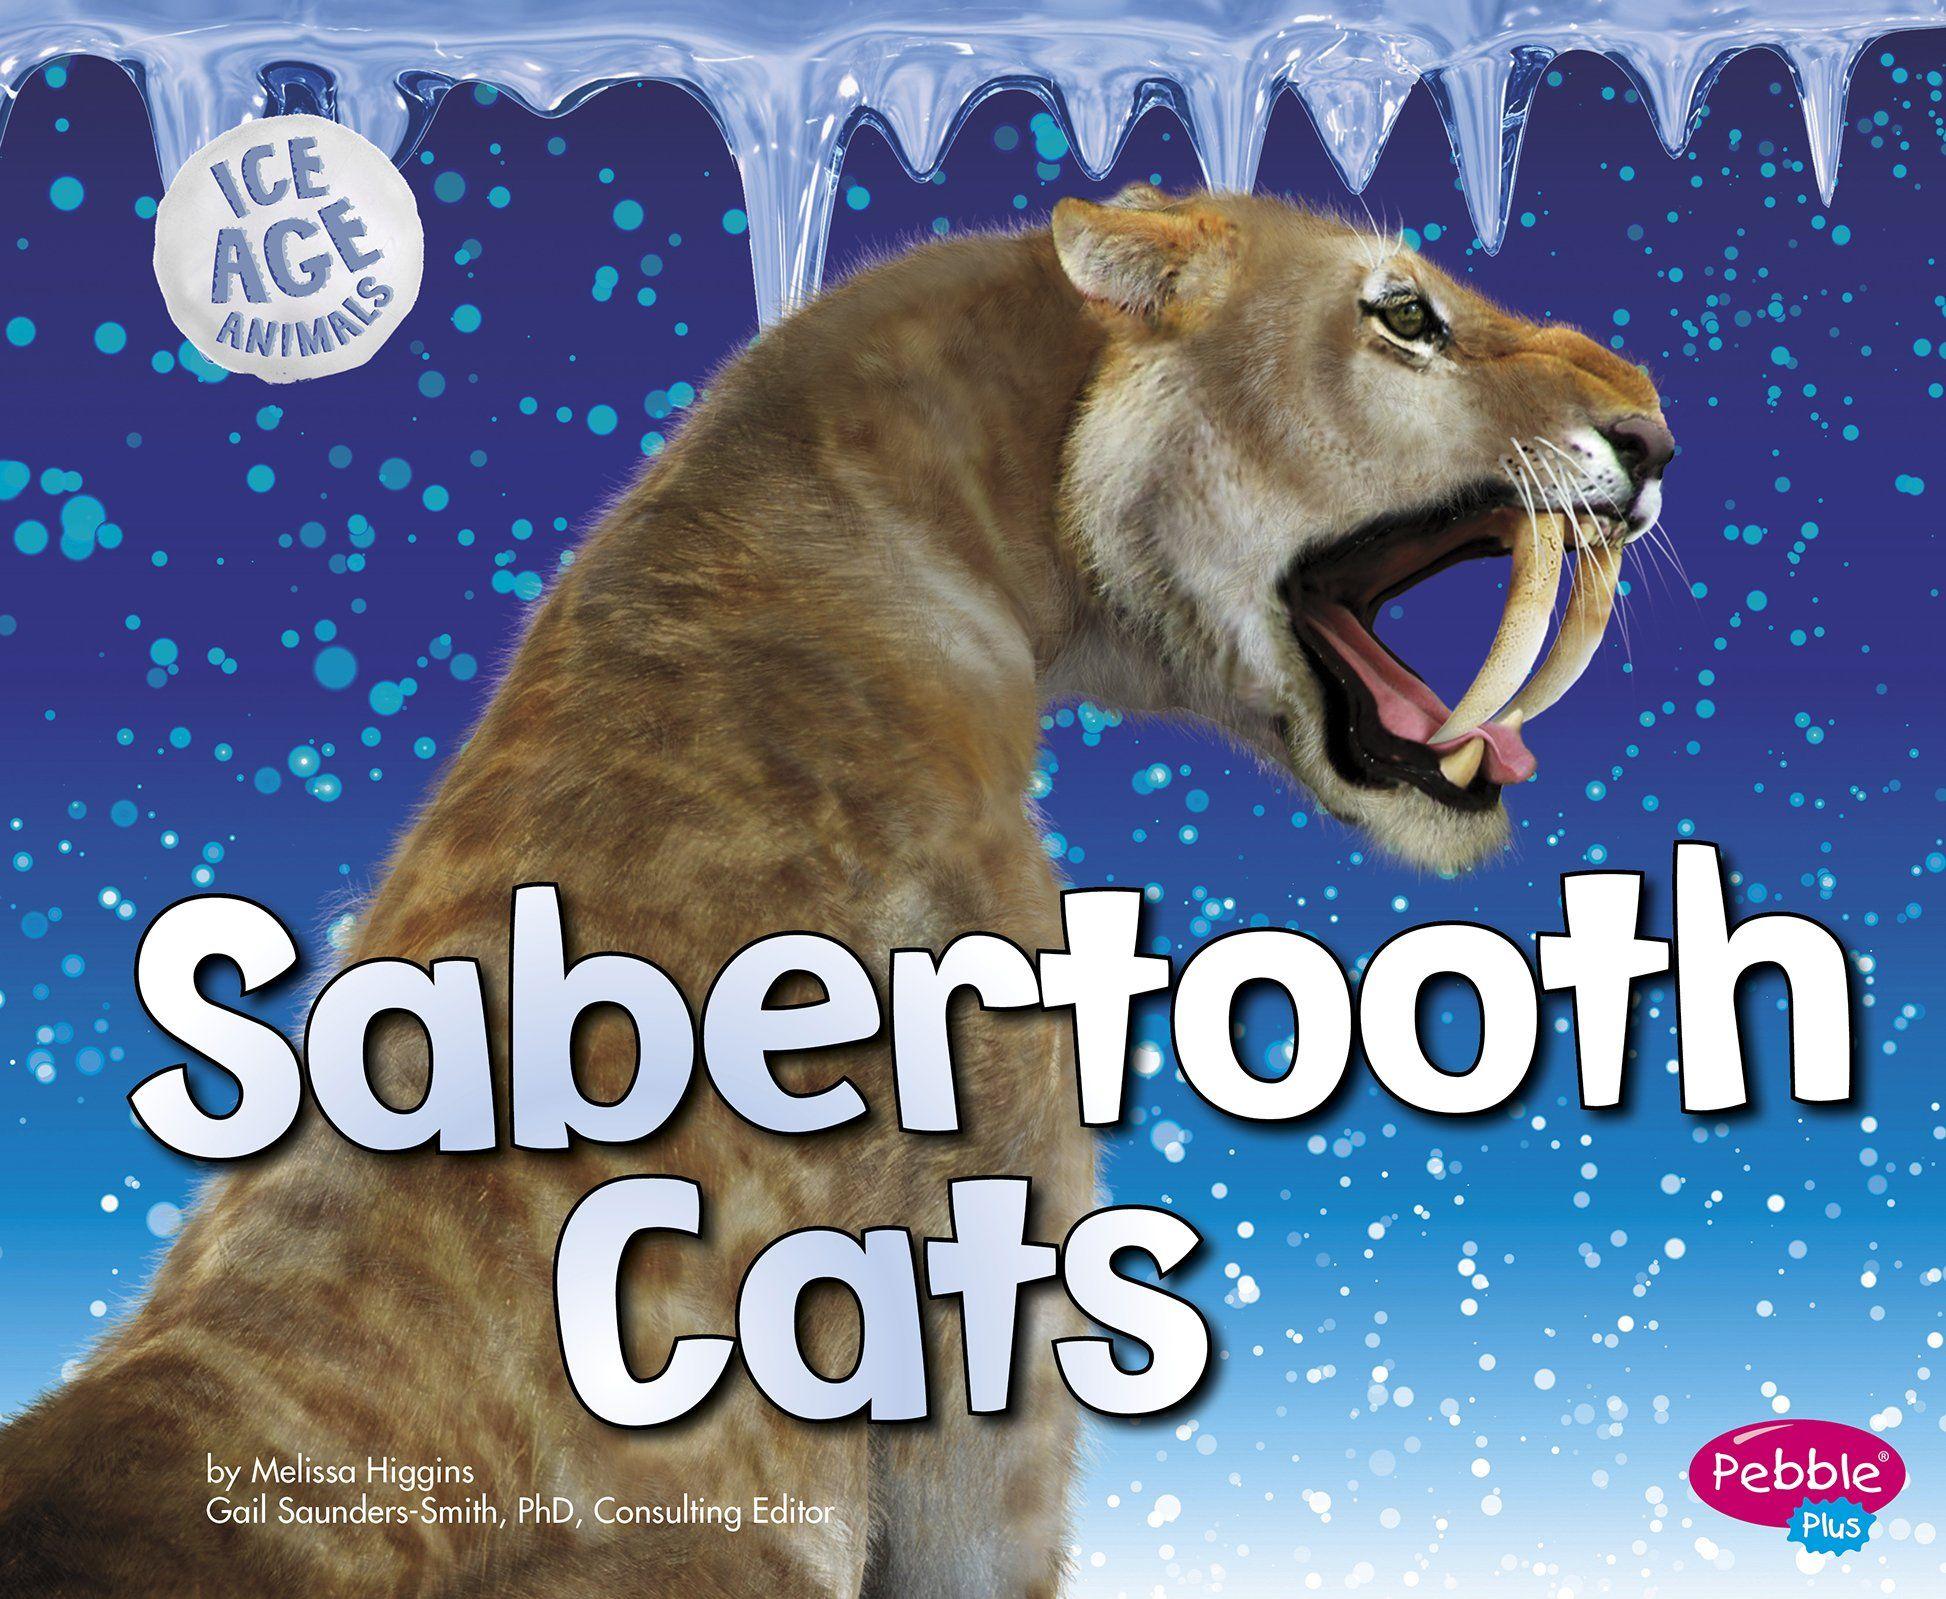 Sabertooth Cats (Ice Age Animals) Melissa Higgins, PhD